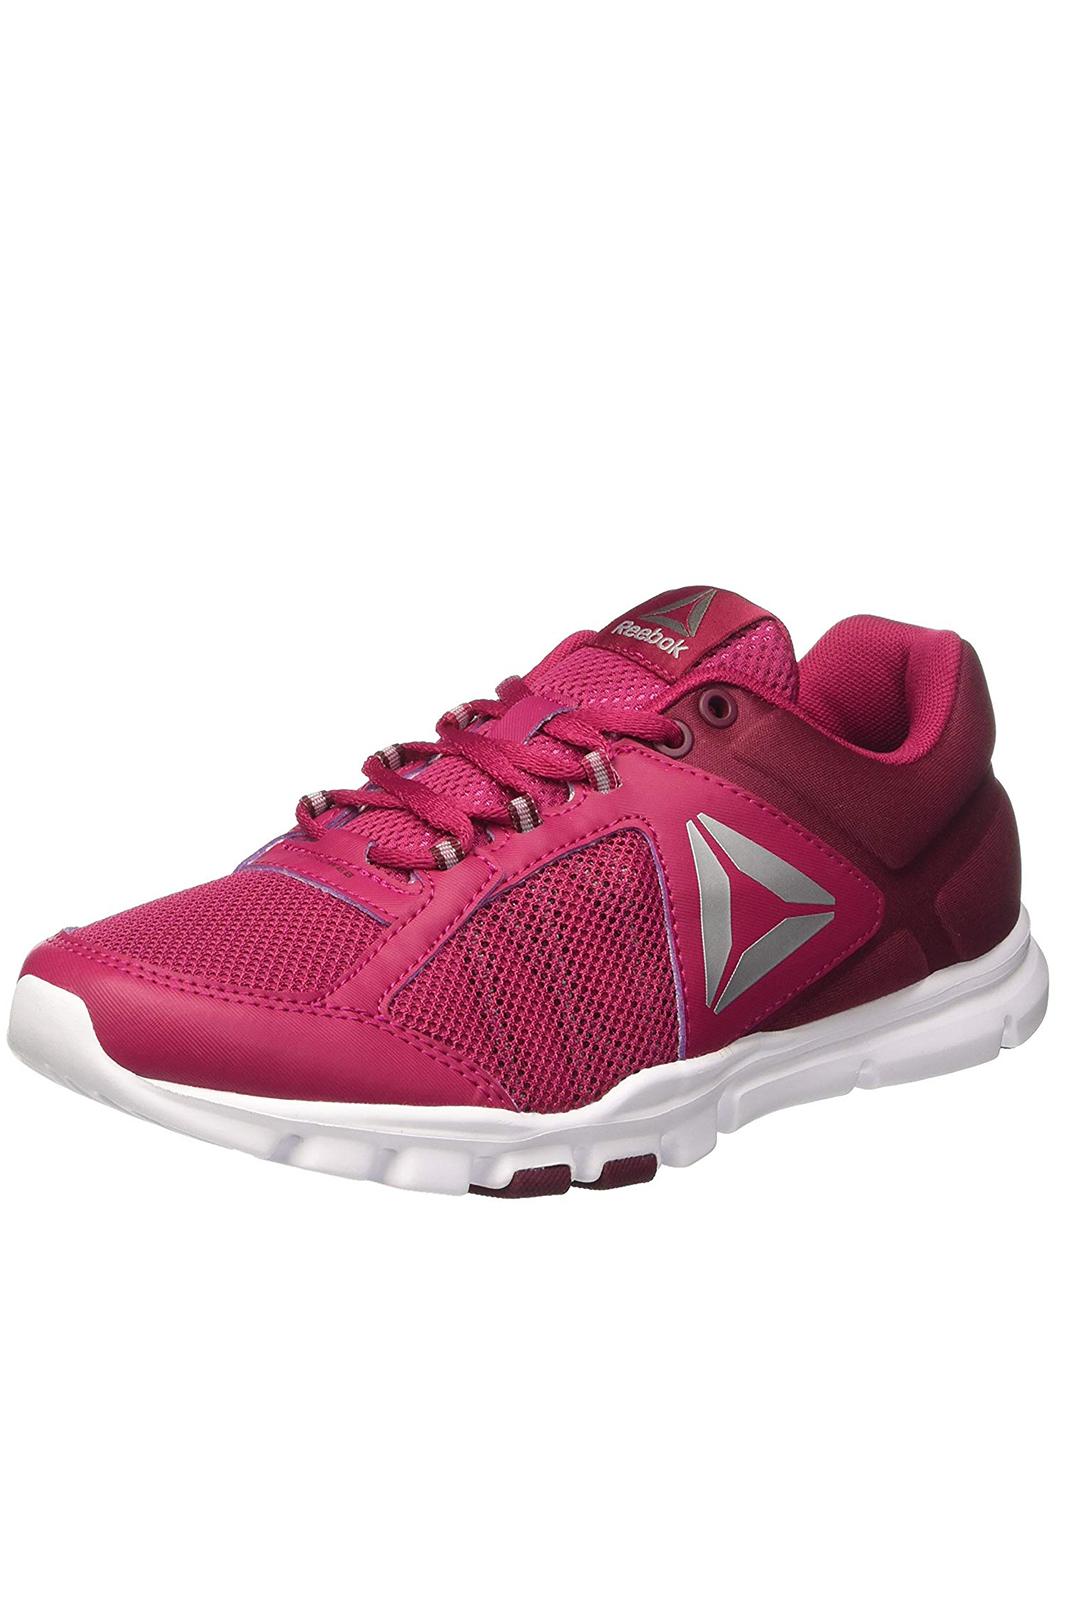 Baskets / Sneakers  Reebok BD5539 SUBLITE XT CUSHION ROSE